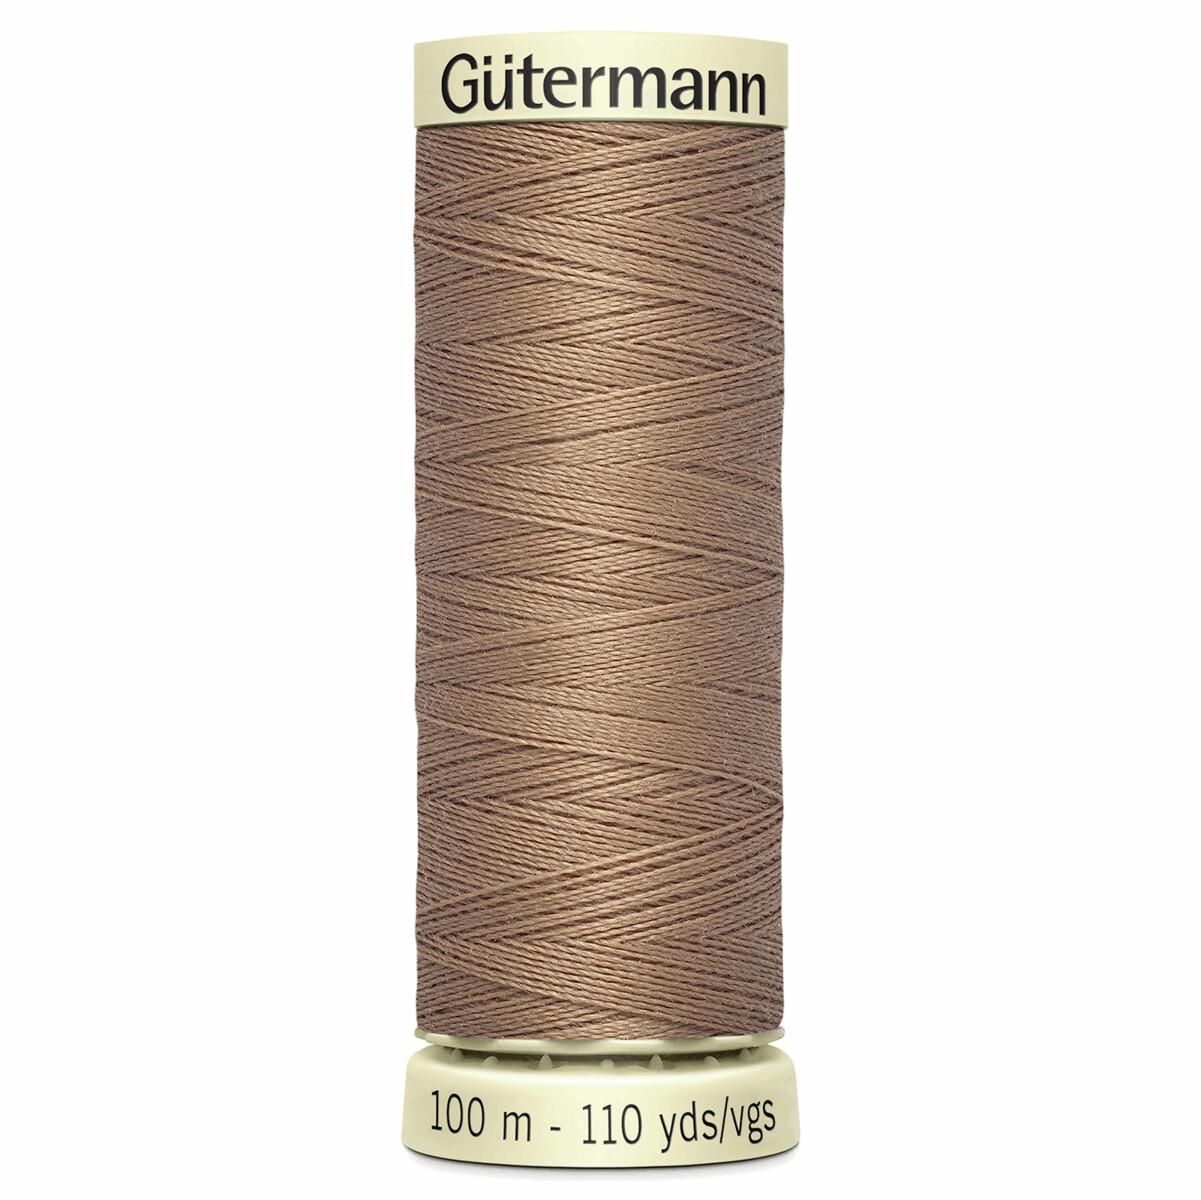 Gutermann Sew-All thread 139